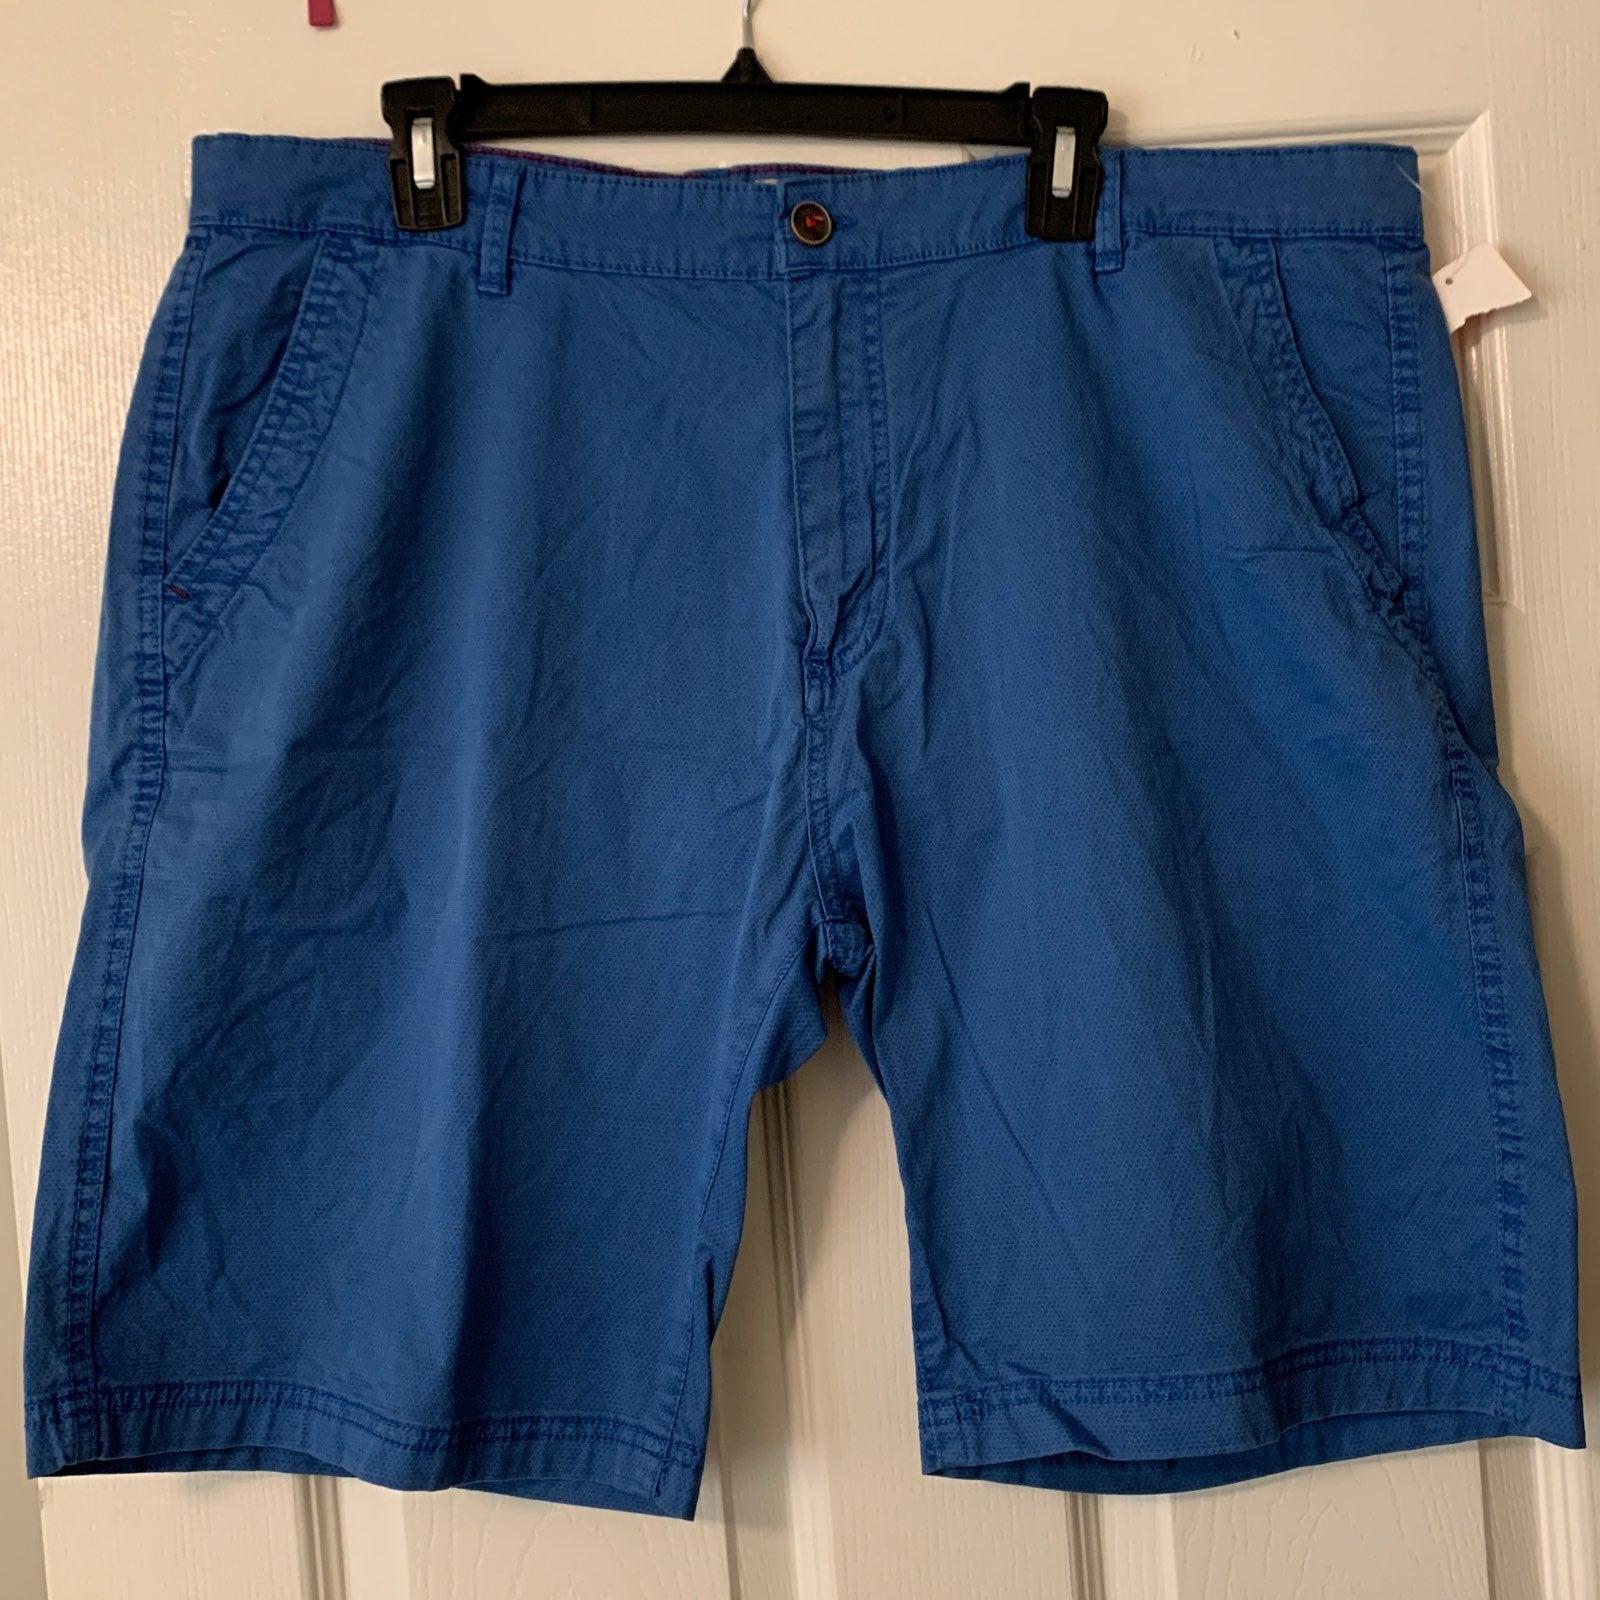 shorts men 40